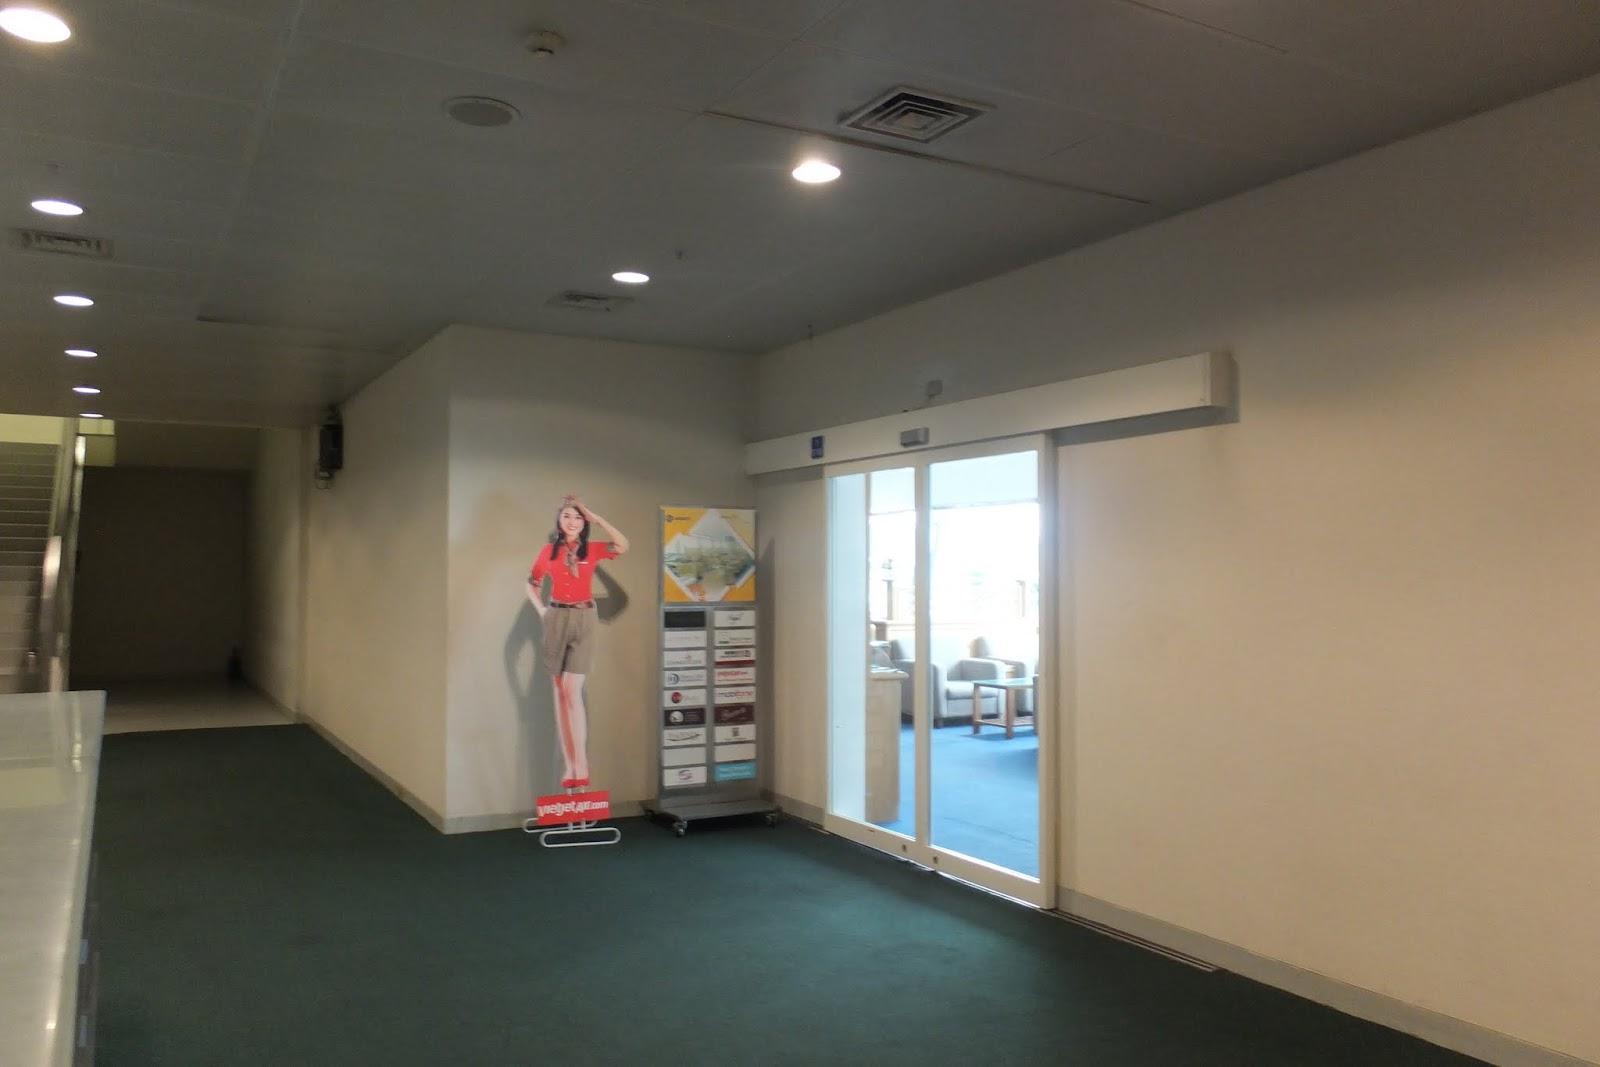 apricot-lounge-hcmc-entrance ホーチミン市の空港ラウンジ入口